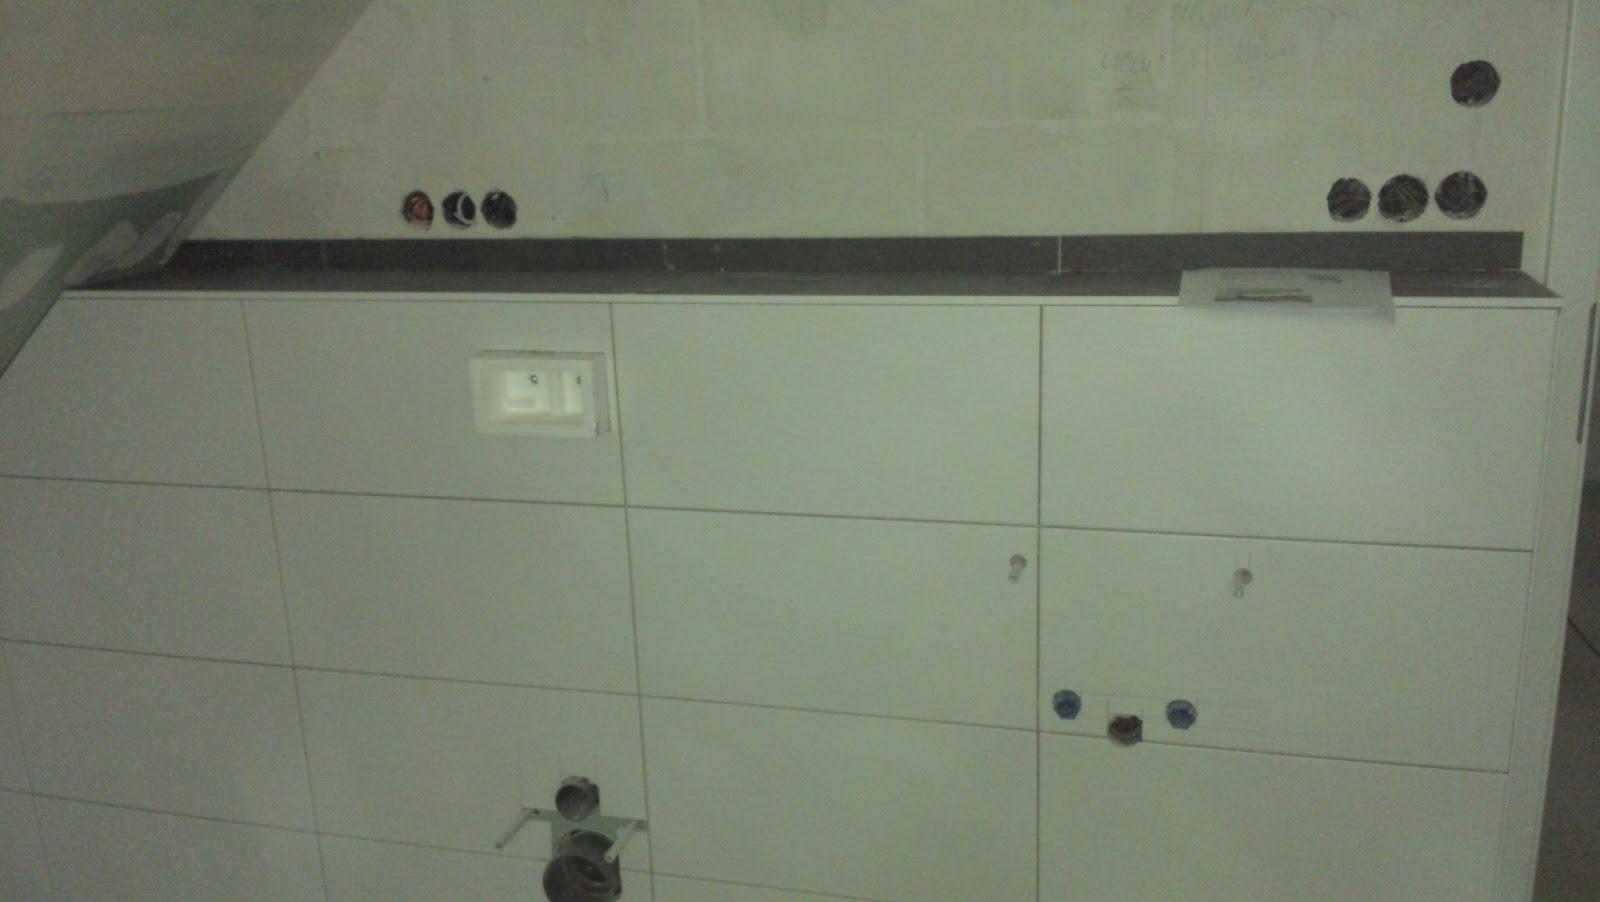 download badezimmer 4life | vitaplaza, Badezimmer ideen